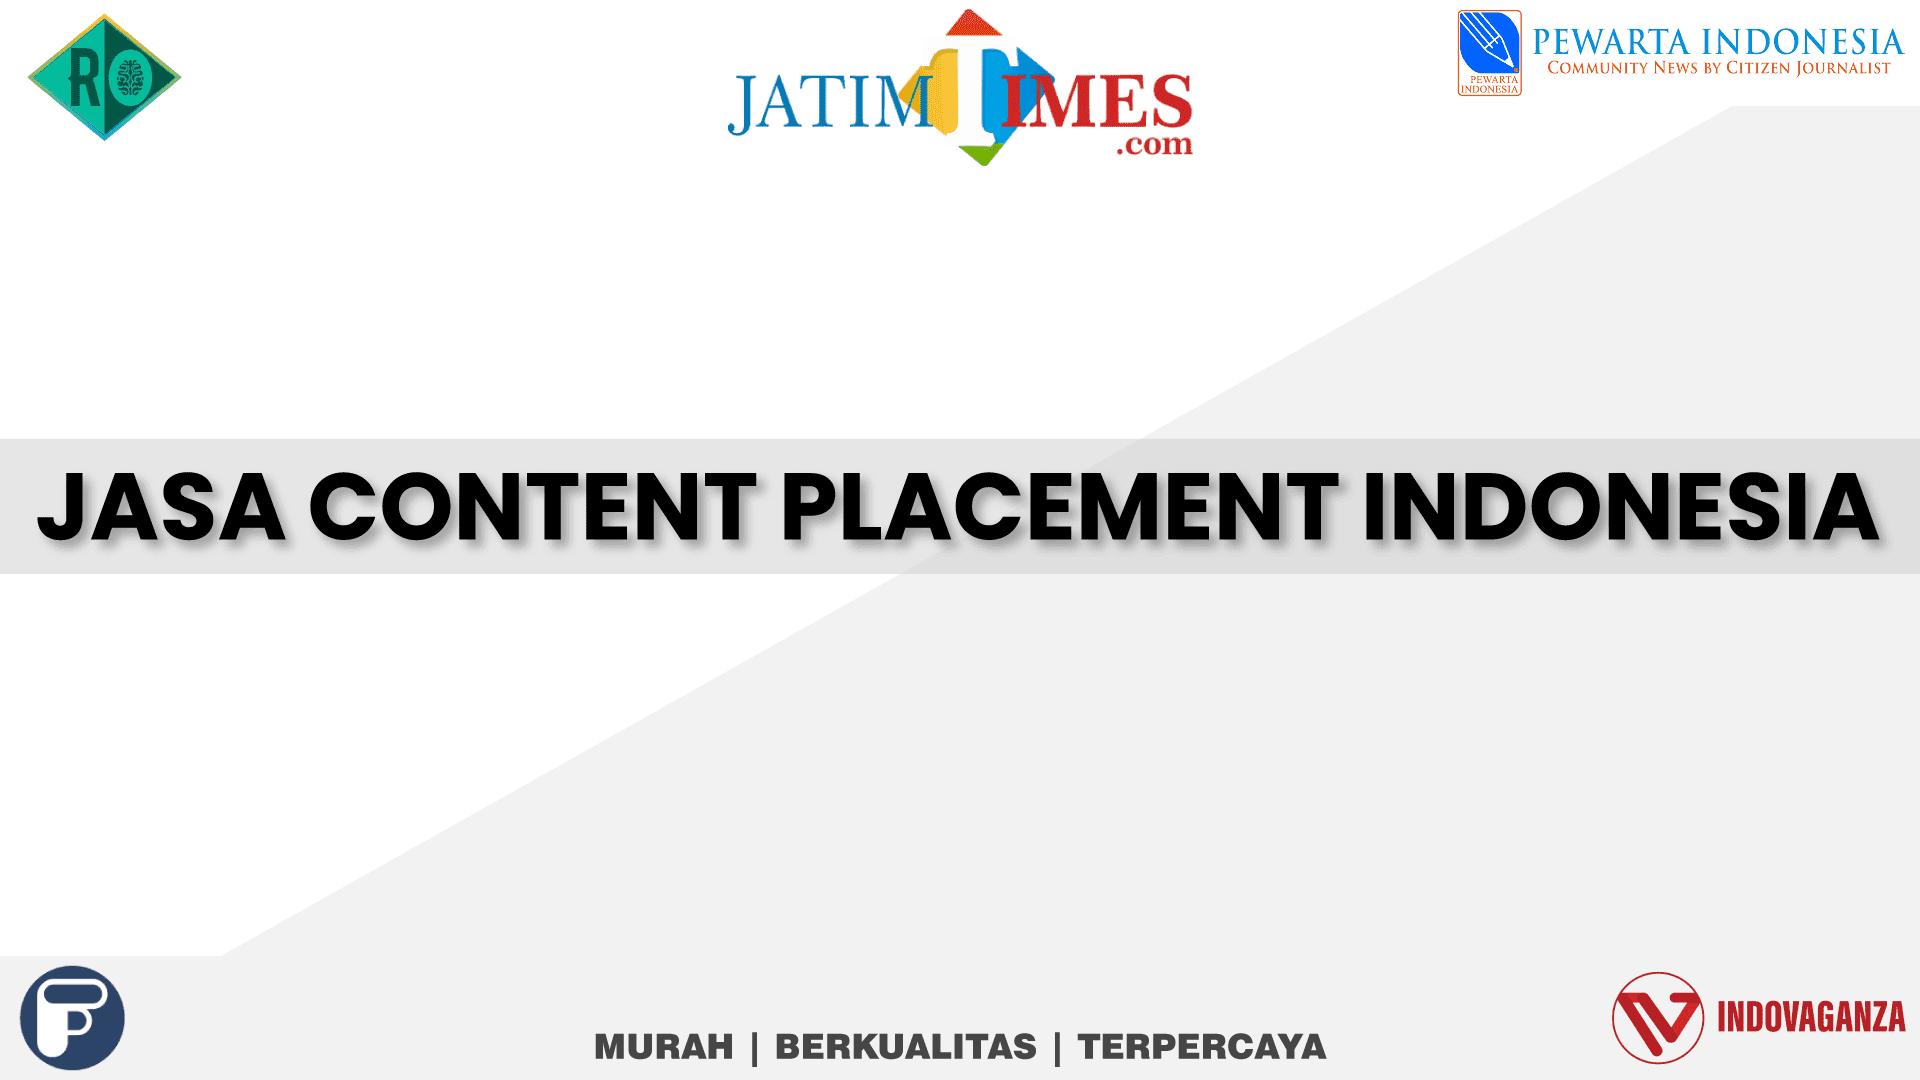 Jasa Content Placement